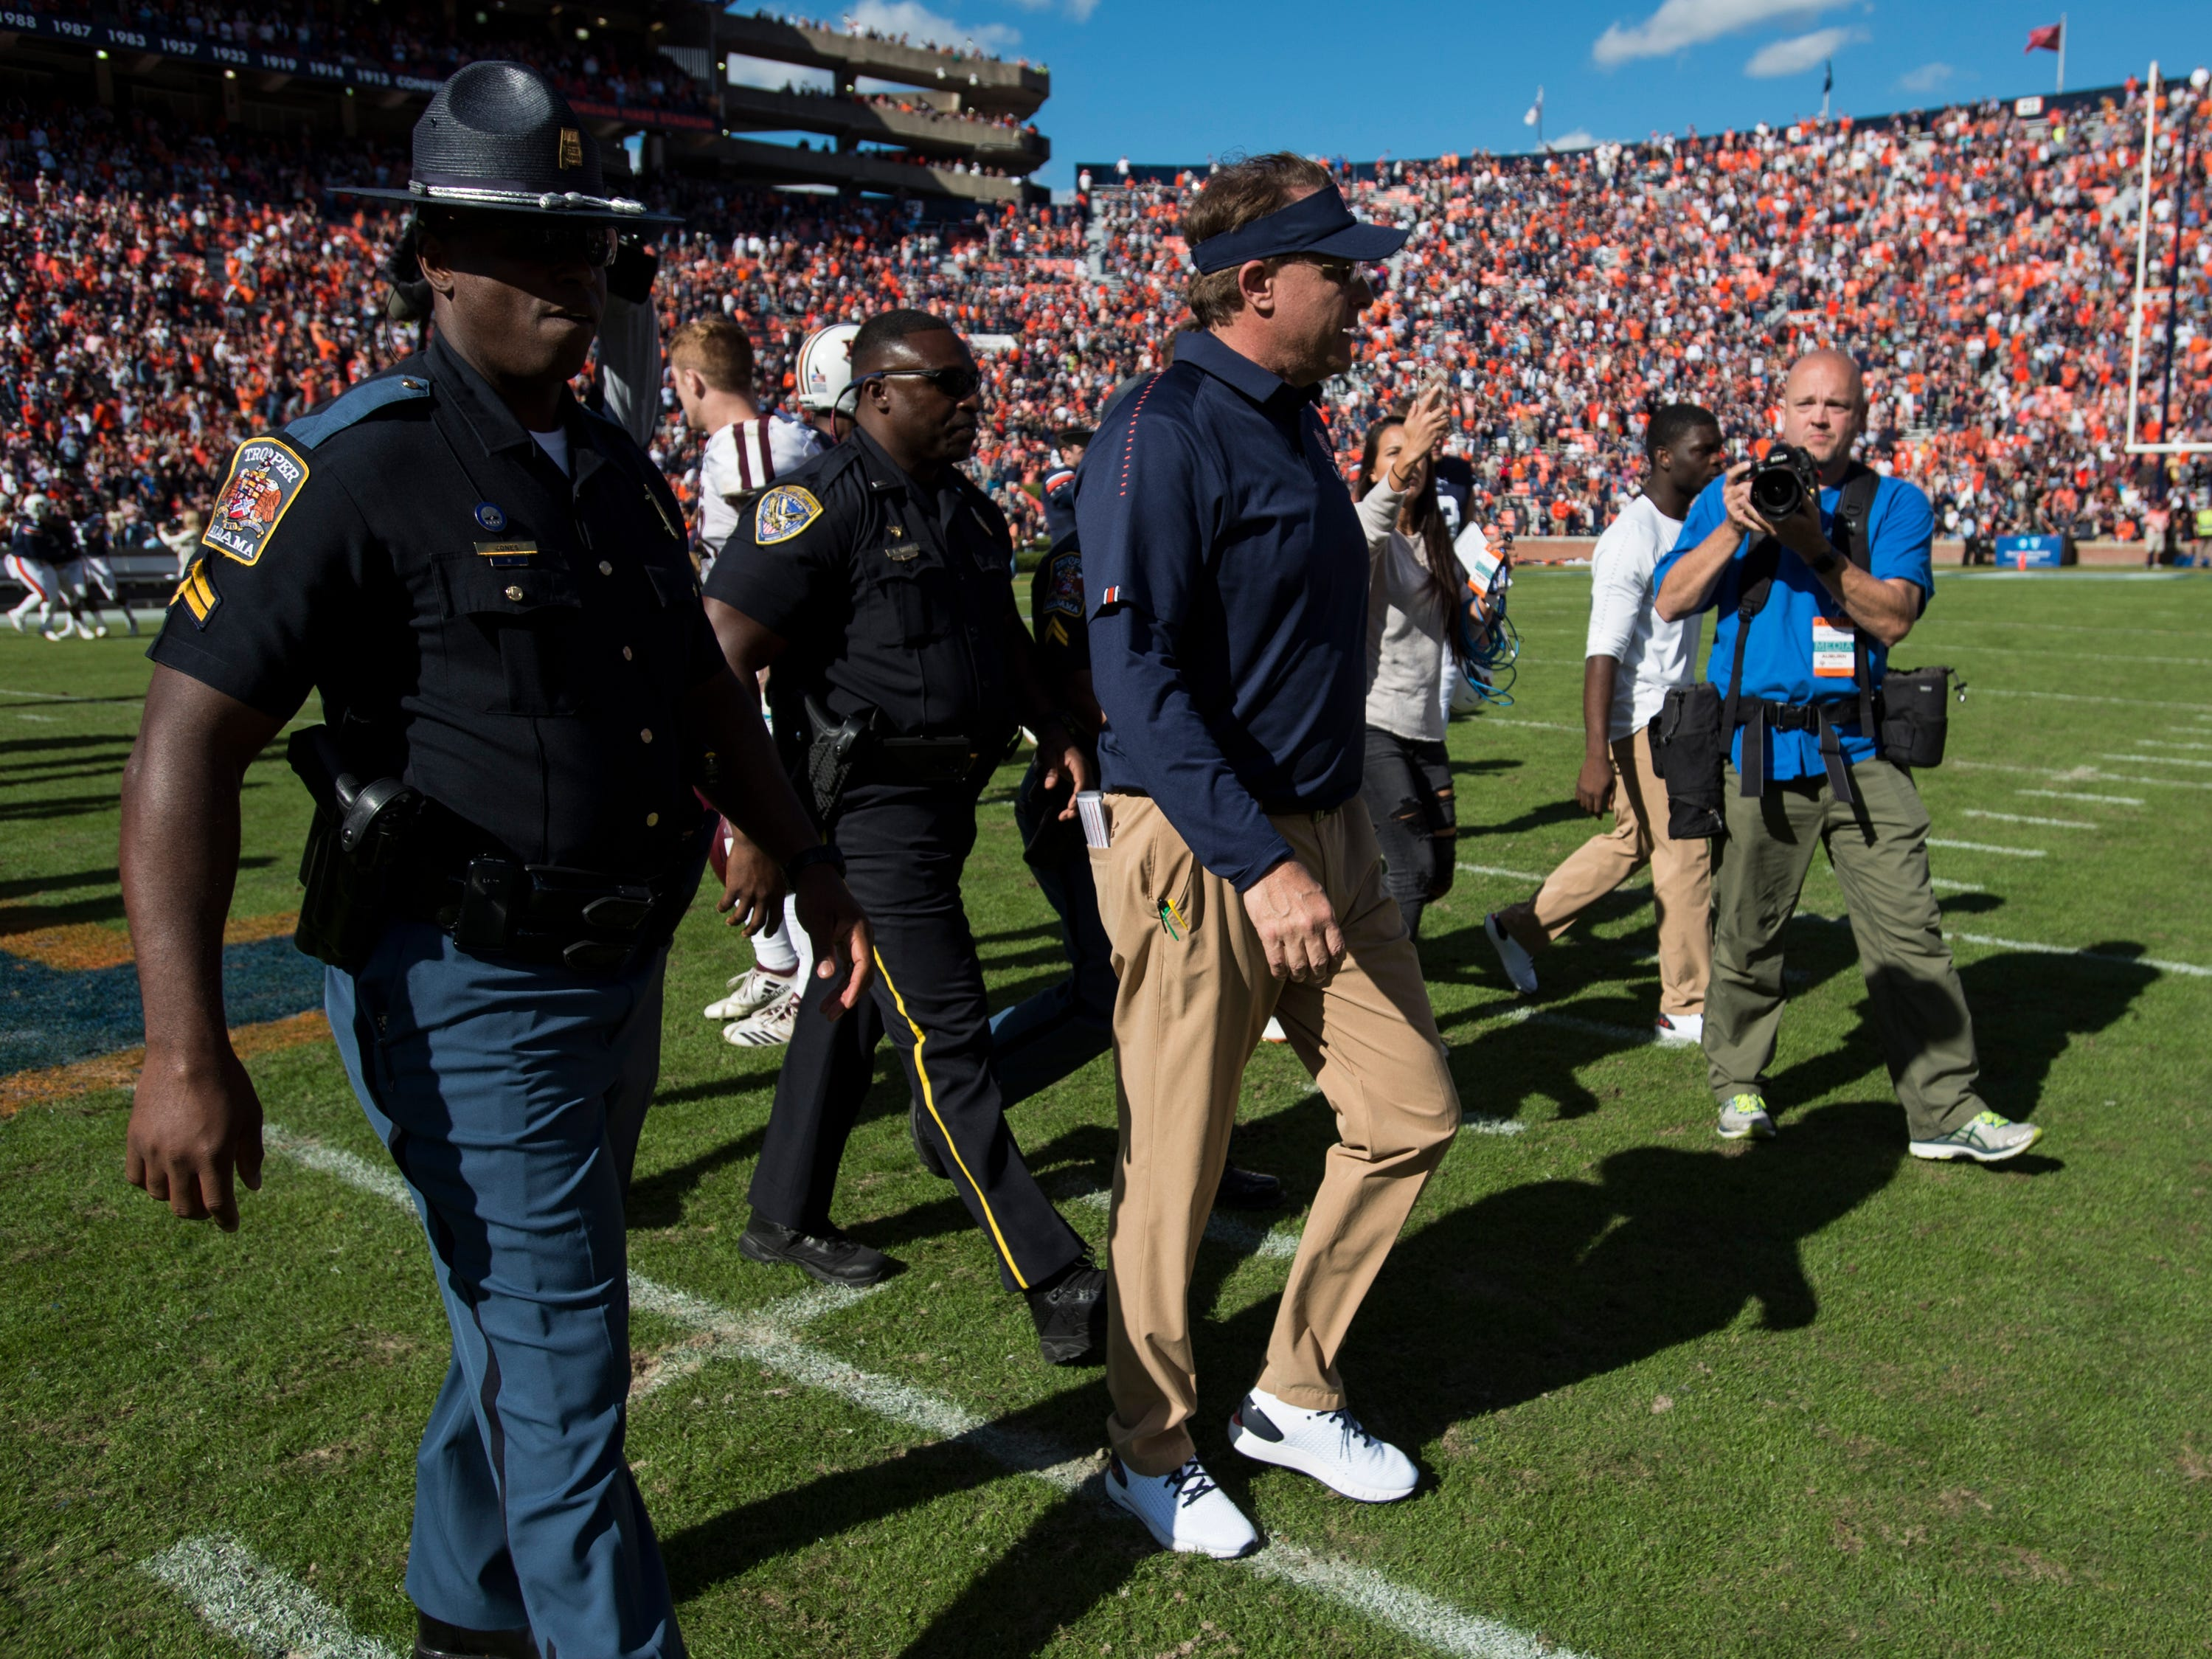 Auburn head coach Gus Malzahn walks to midfield after the game at Jordan-Hare Stadium on Saturday, Nov. 3, 2018. Auburn defeated Texas A&M 28-24.